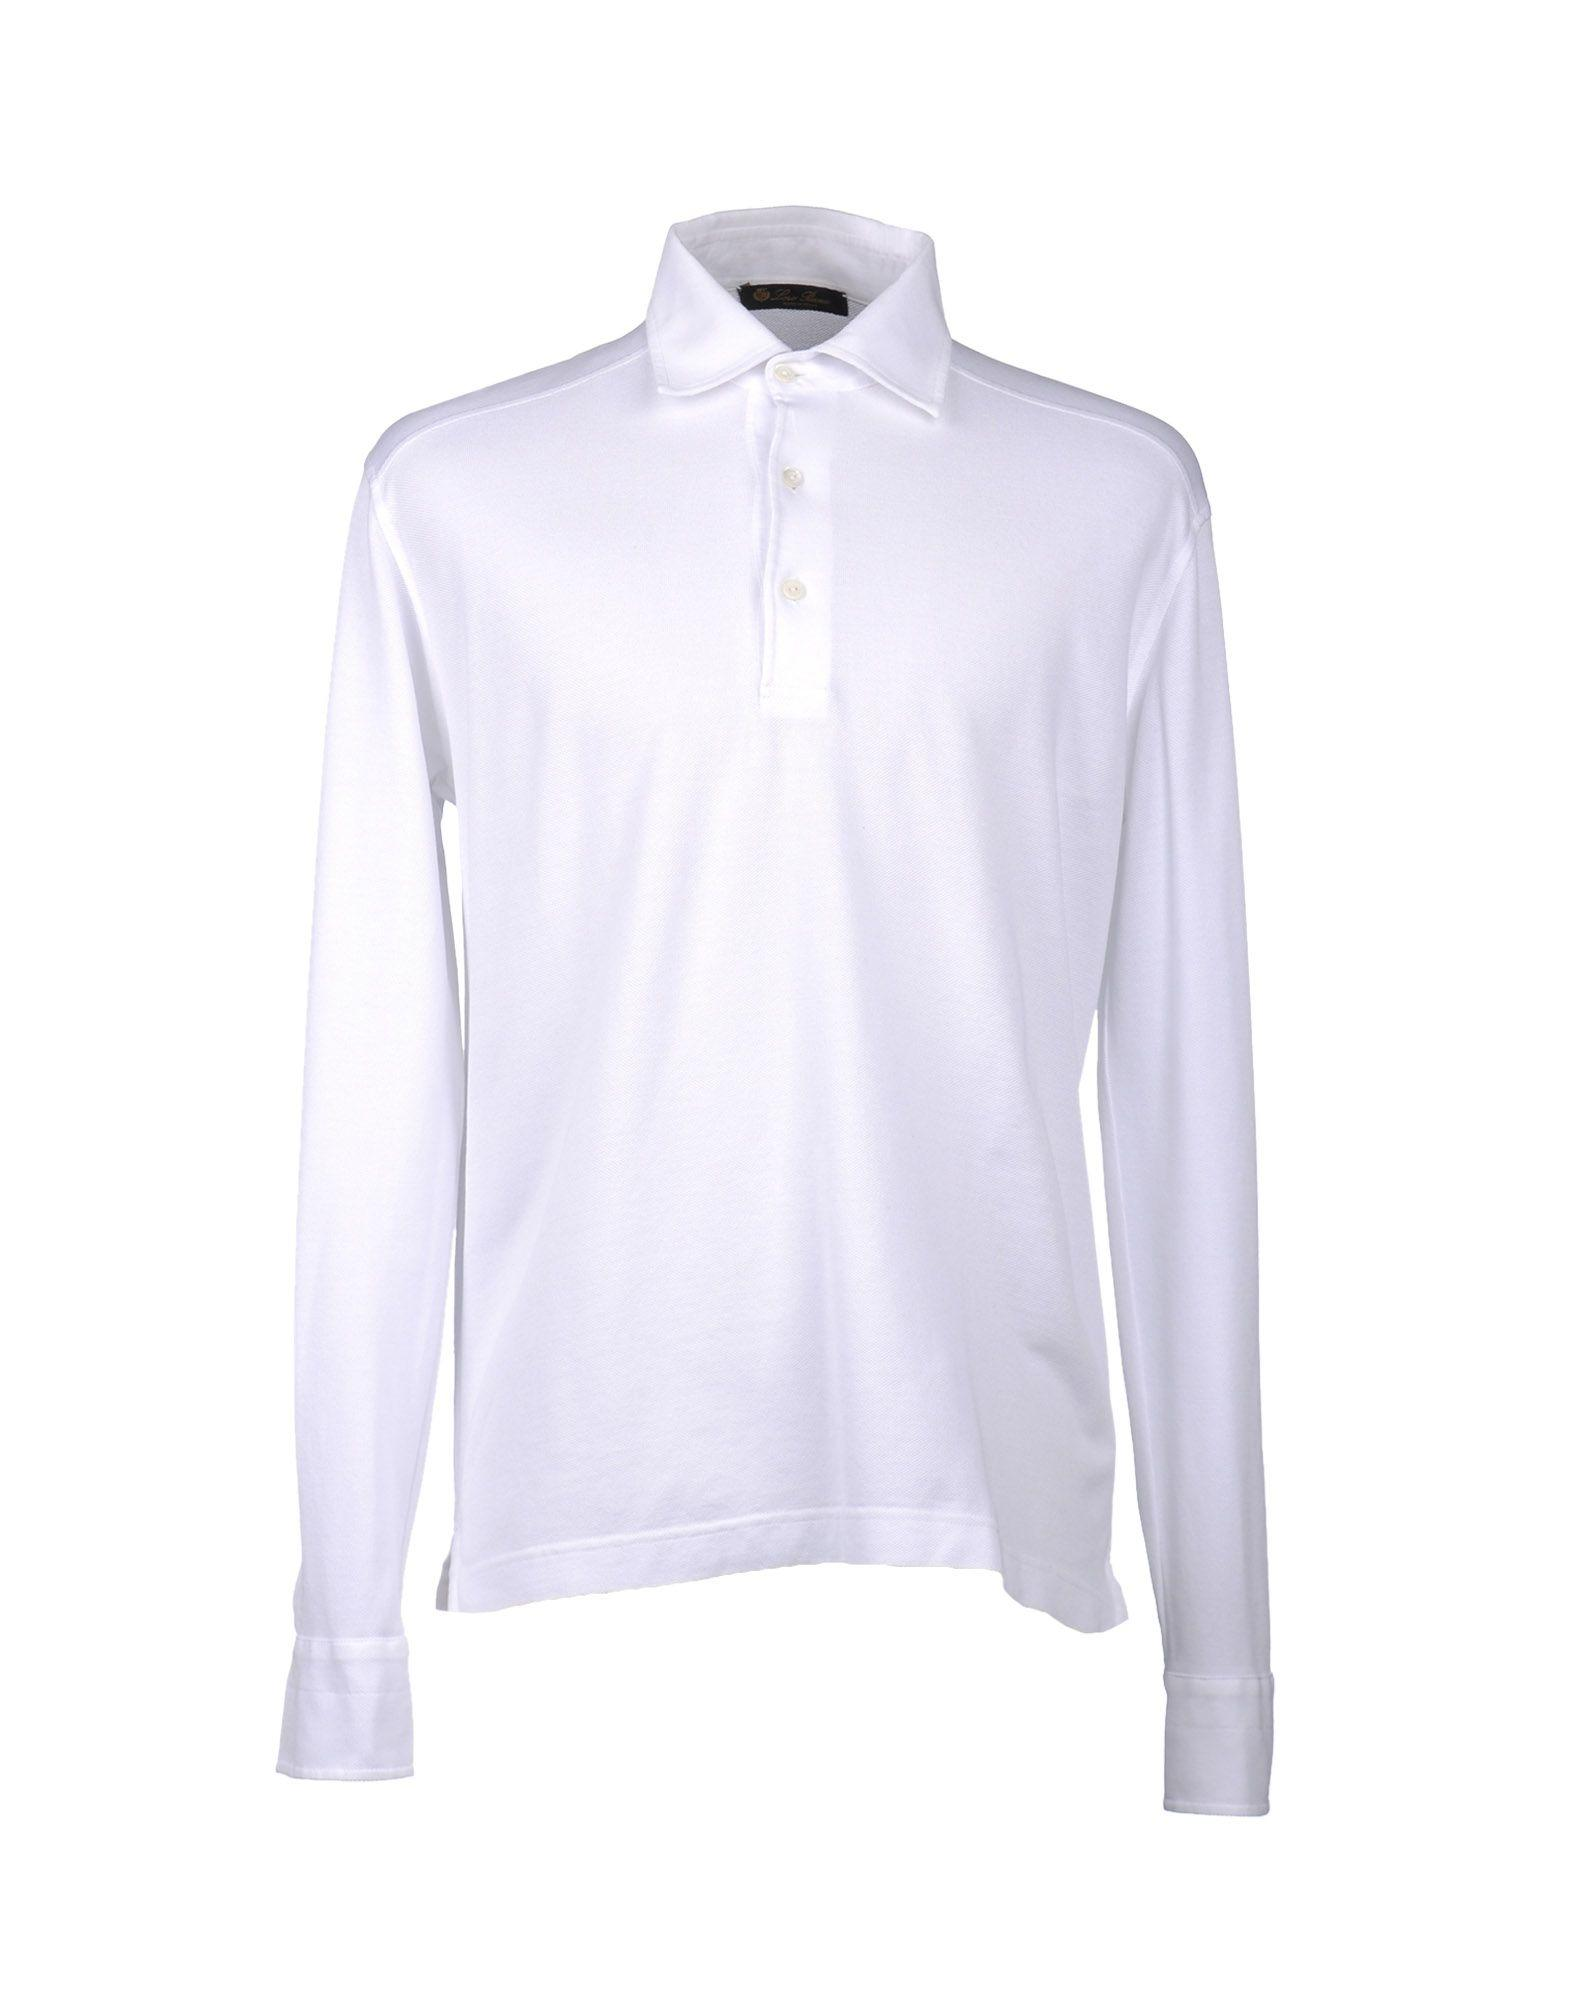 Loro Piana Polo Shirt In White